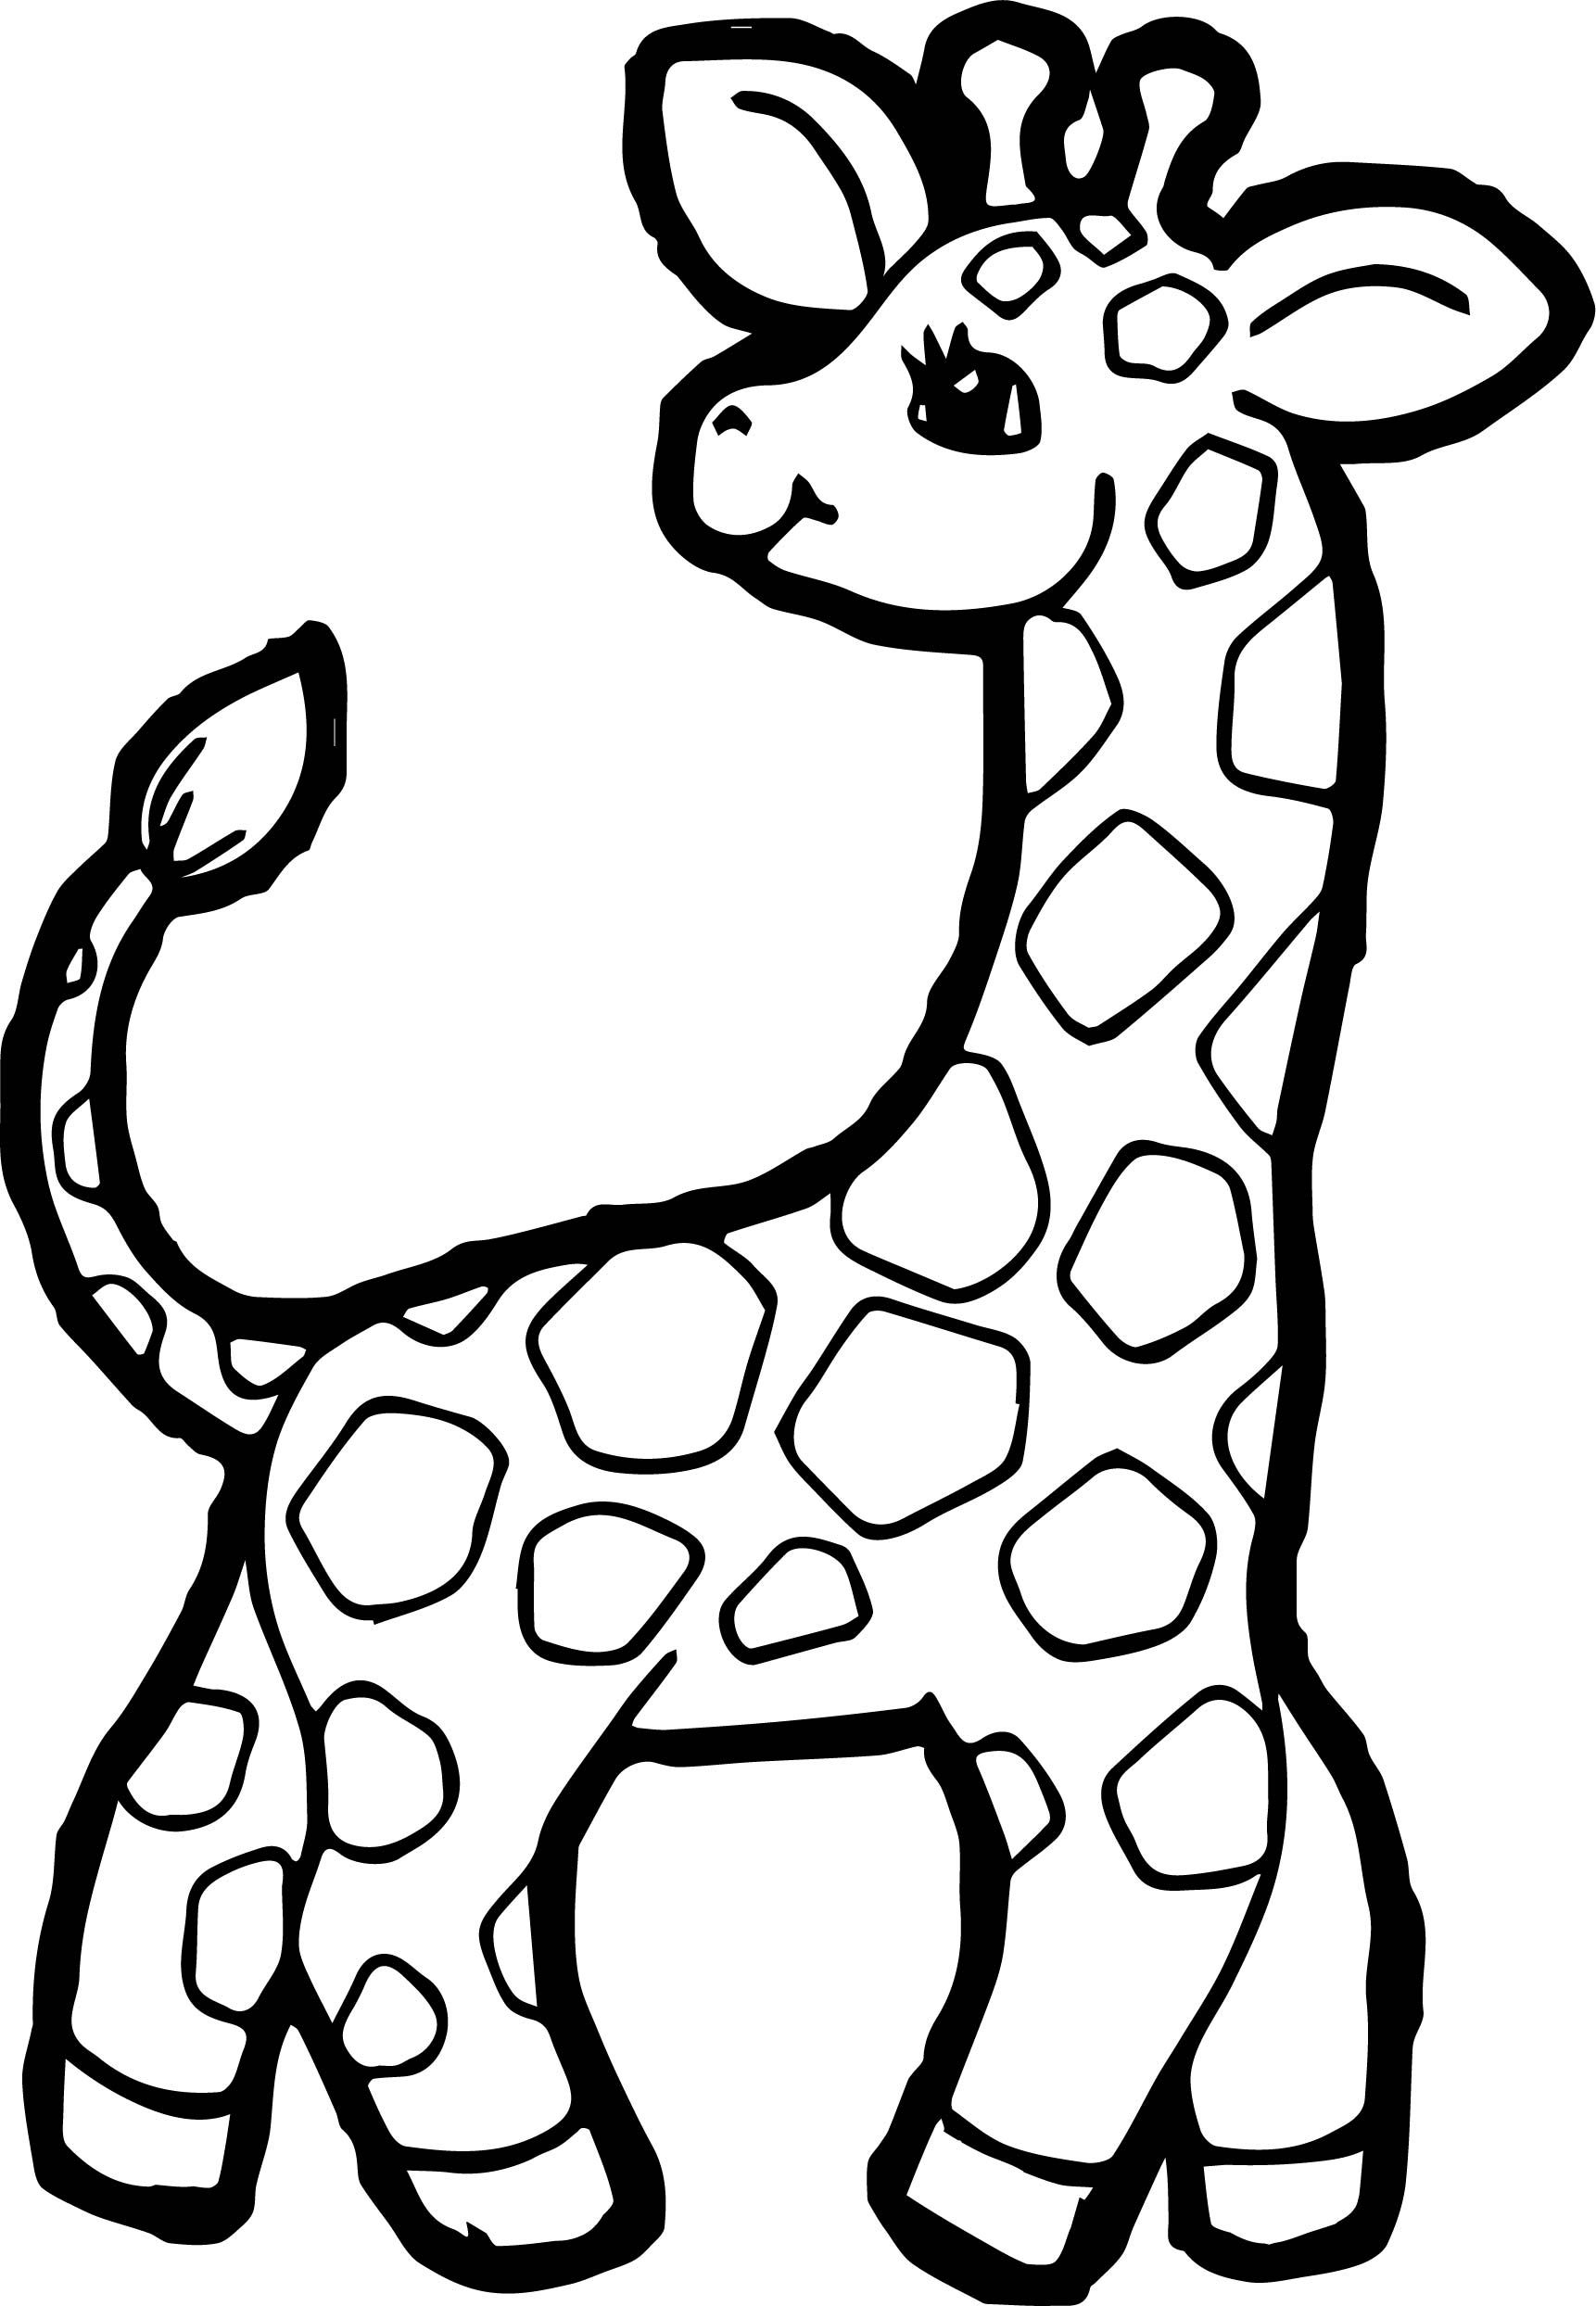 Preschool Giraffe Coloring Page